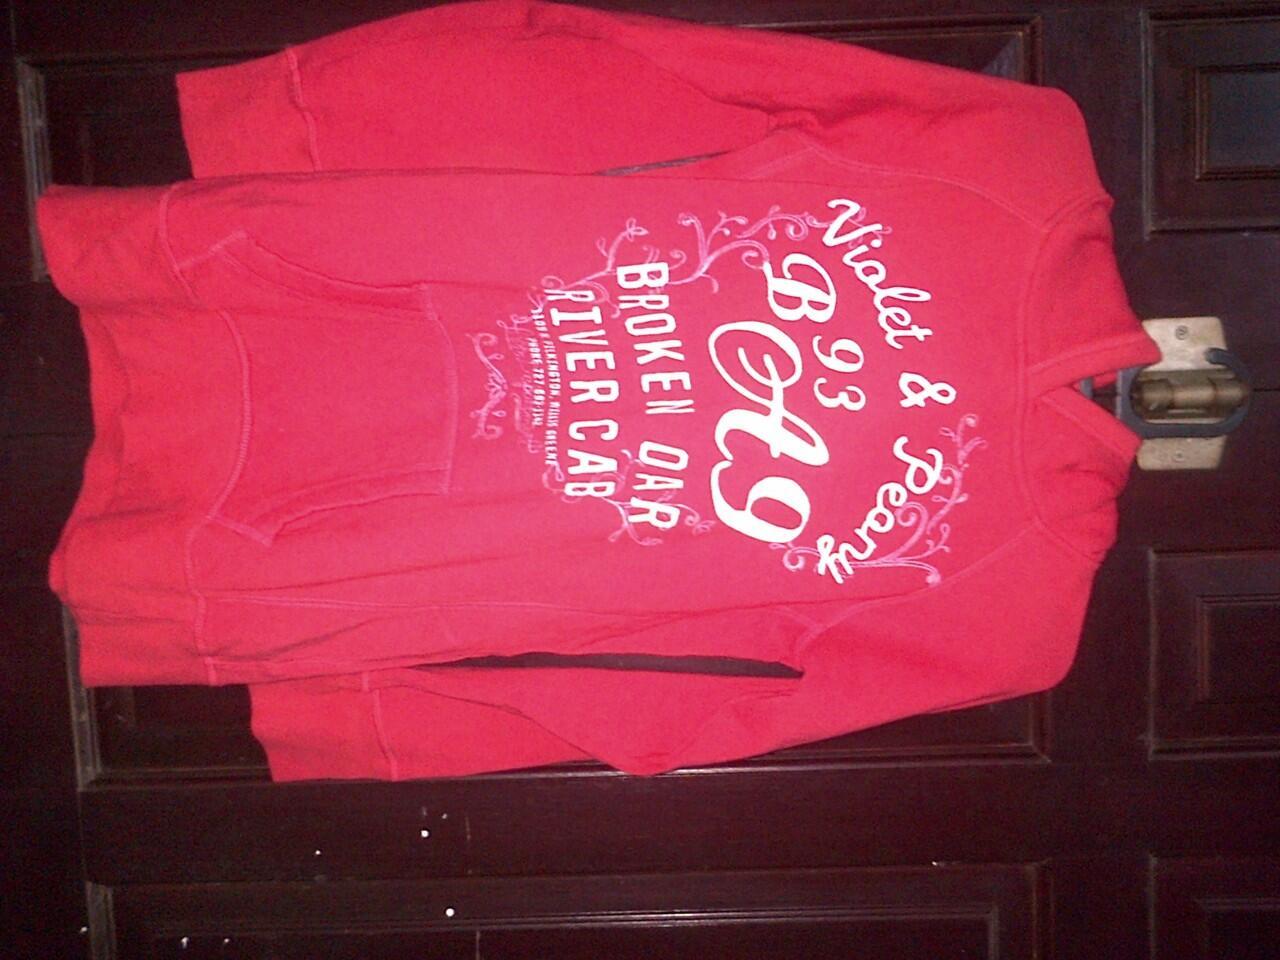 BIG SALE!! OBRAL Kaos, Jeans Jacket, Jeans, Pants,Shirt,Polo Shirt,Dress BRANDED ORI